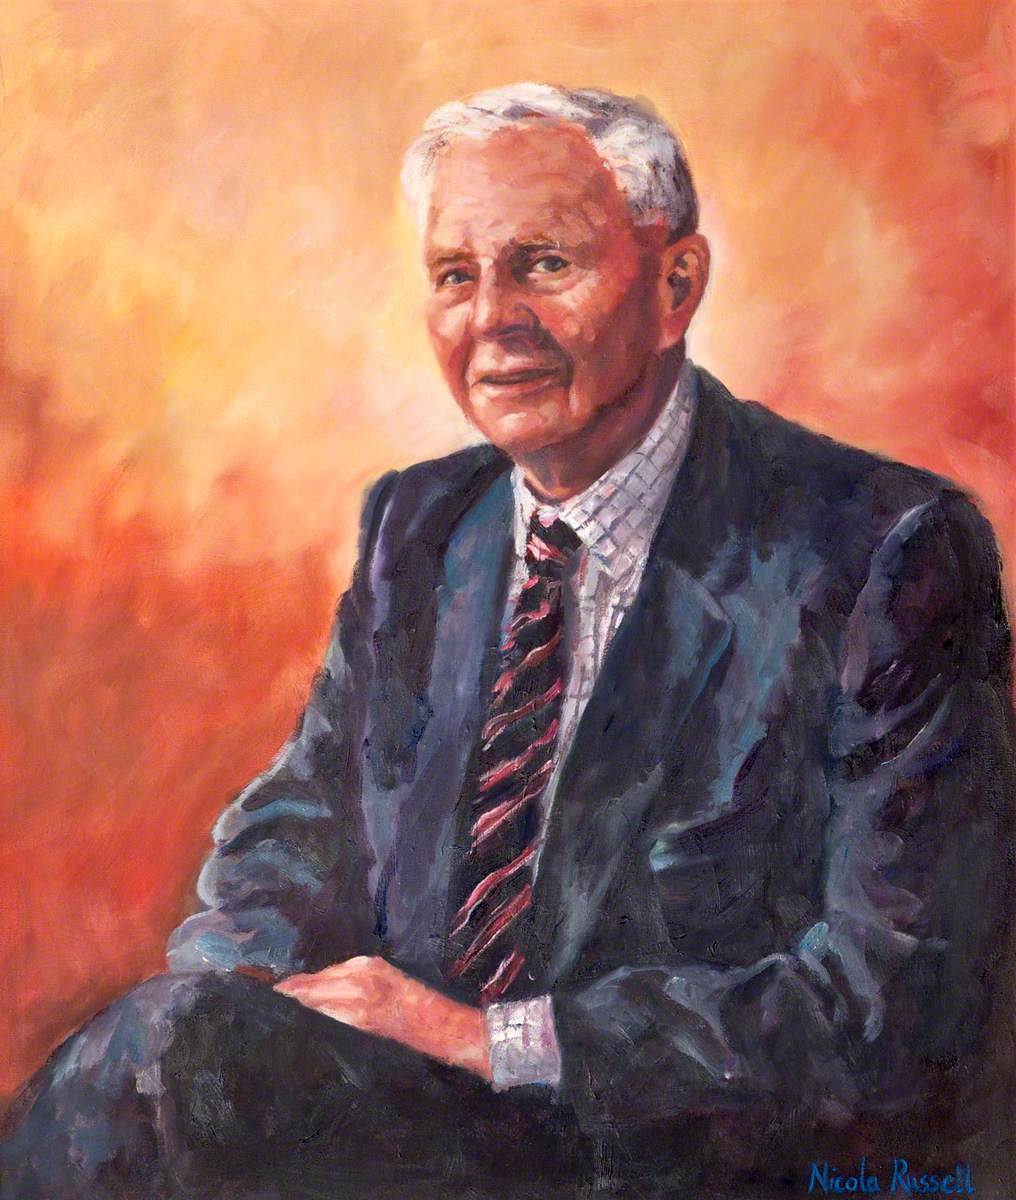 Peter Roemele